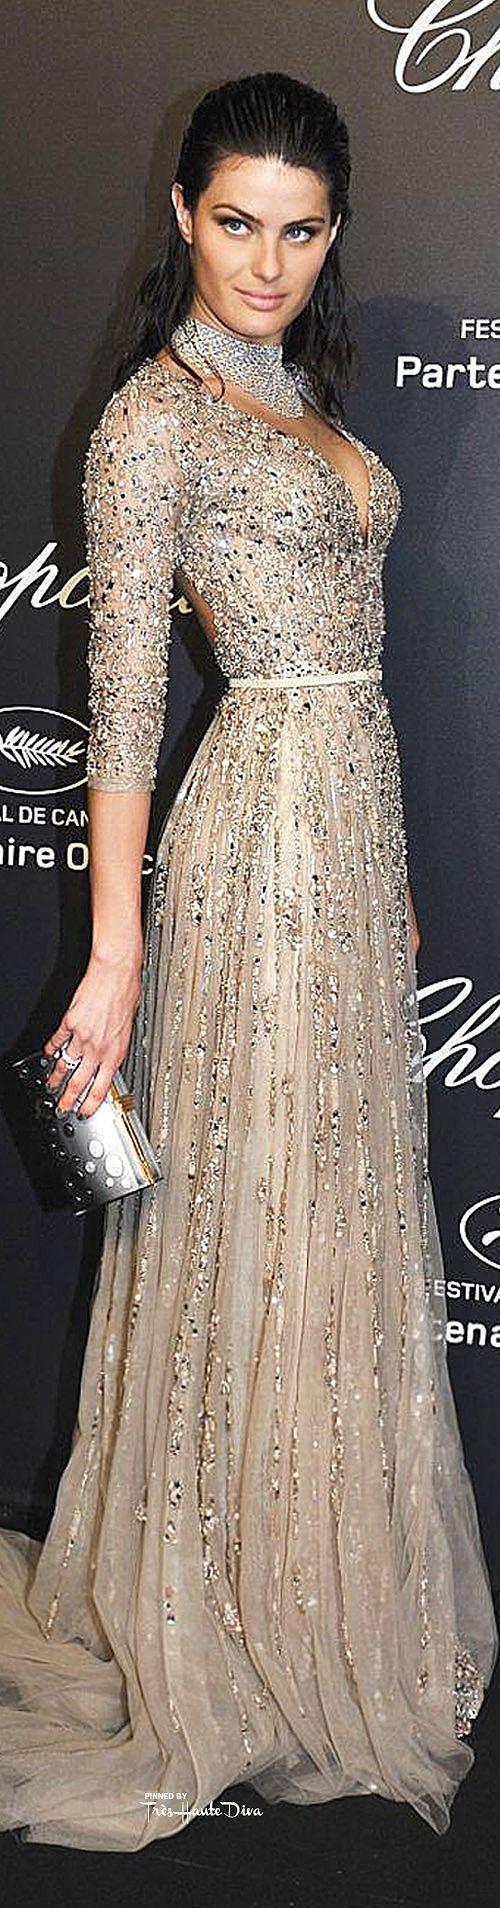 #Isabeli #Fontana♔ Cannes Film Festival 2015 Red Carpet ♔ Très Haute Diva ♔